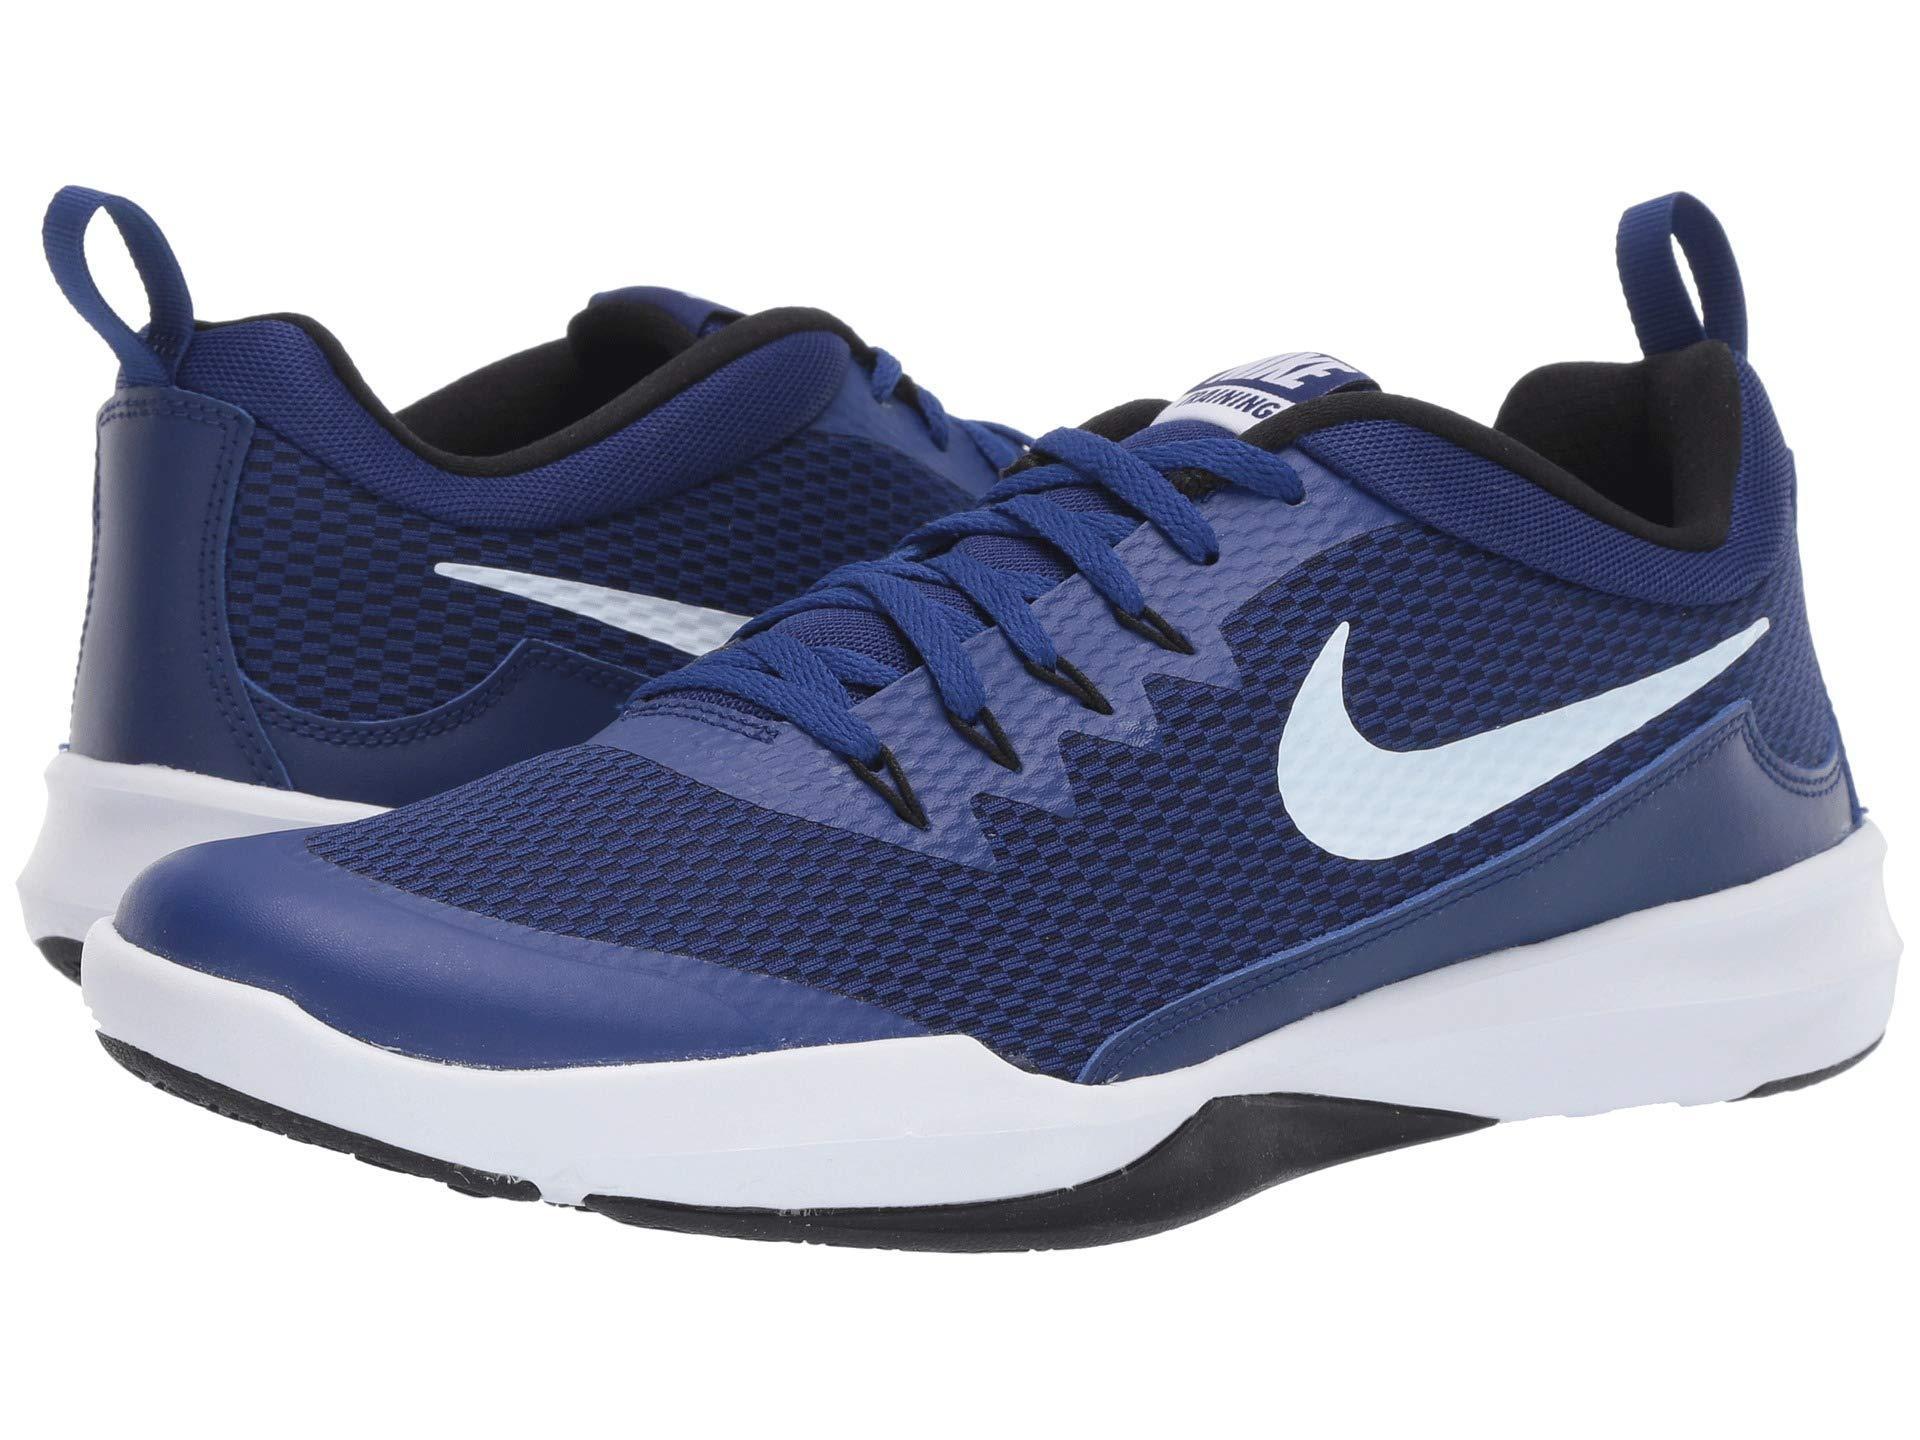 03cdca2ec3dfc Lyst - Nike Legend Trainer (deep Royal Blue white black) Men s Cross ...